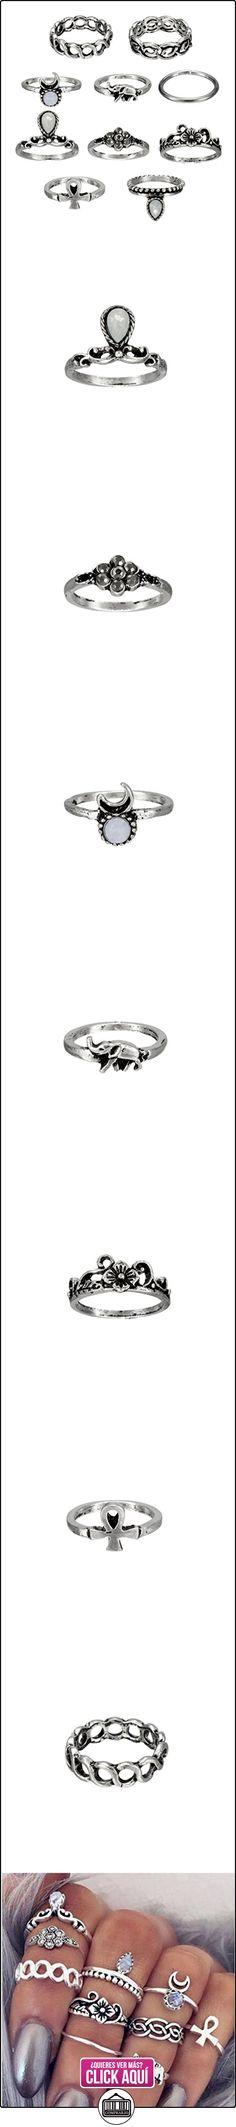 10pezzi Vintage Knuckle Ring Anillo Tribal Ethnic Hippie Joint Punk Ring Anillo Juego para mujer  ✿ Joyas para mujer - Las mejores ofertas ✿ ▬► Ver oferta: https://comprar.io/goto/0285326422